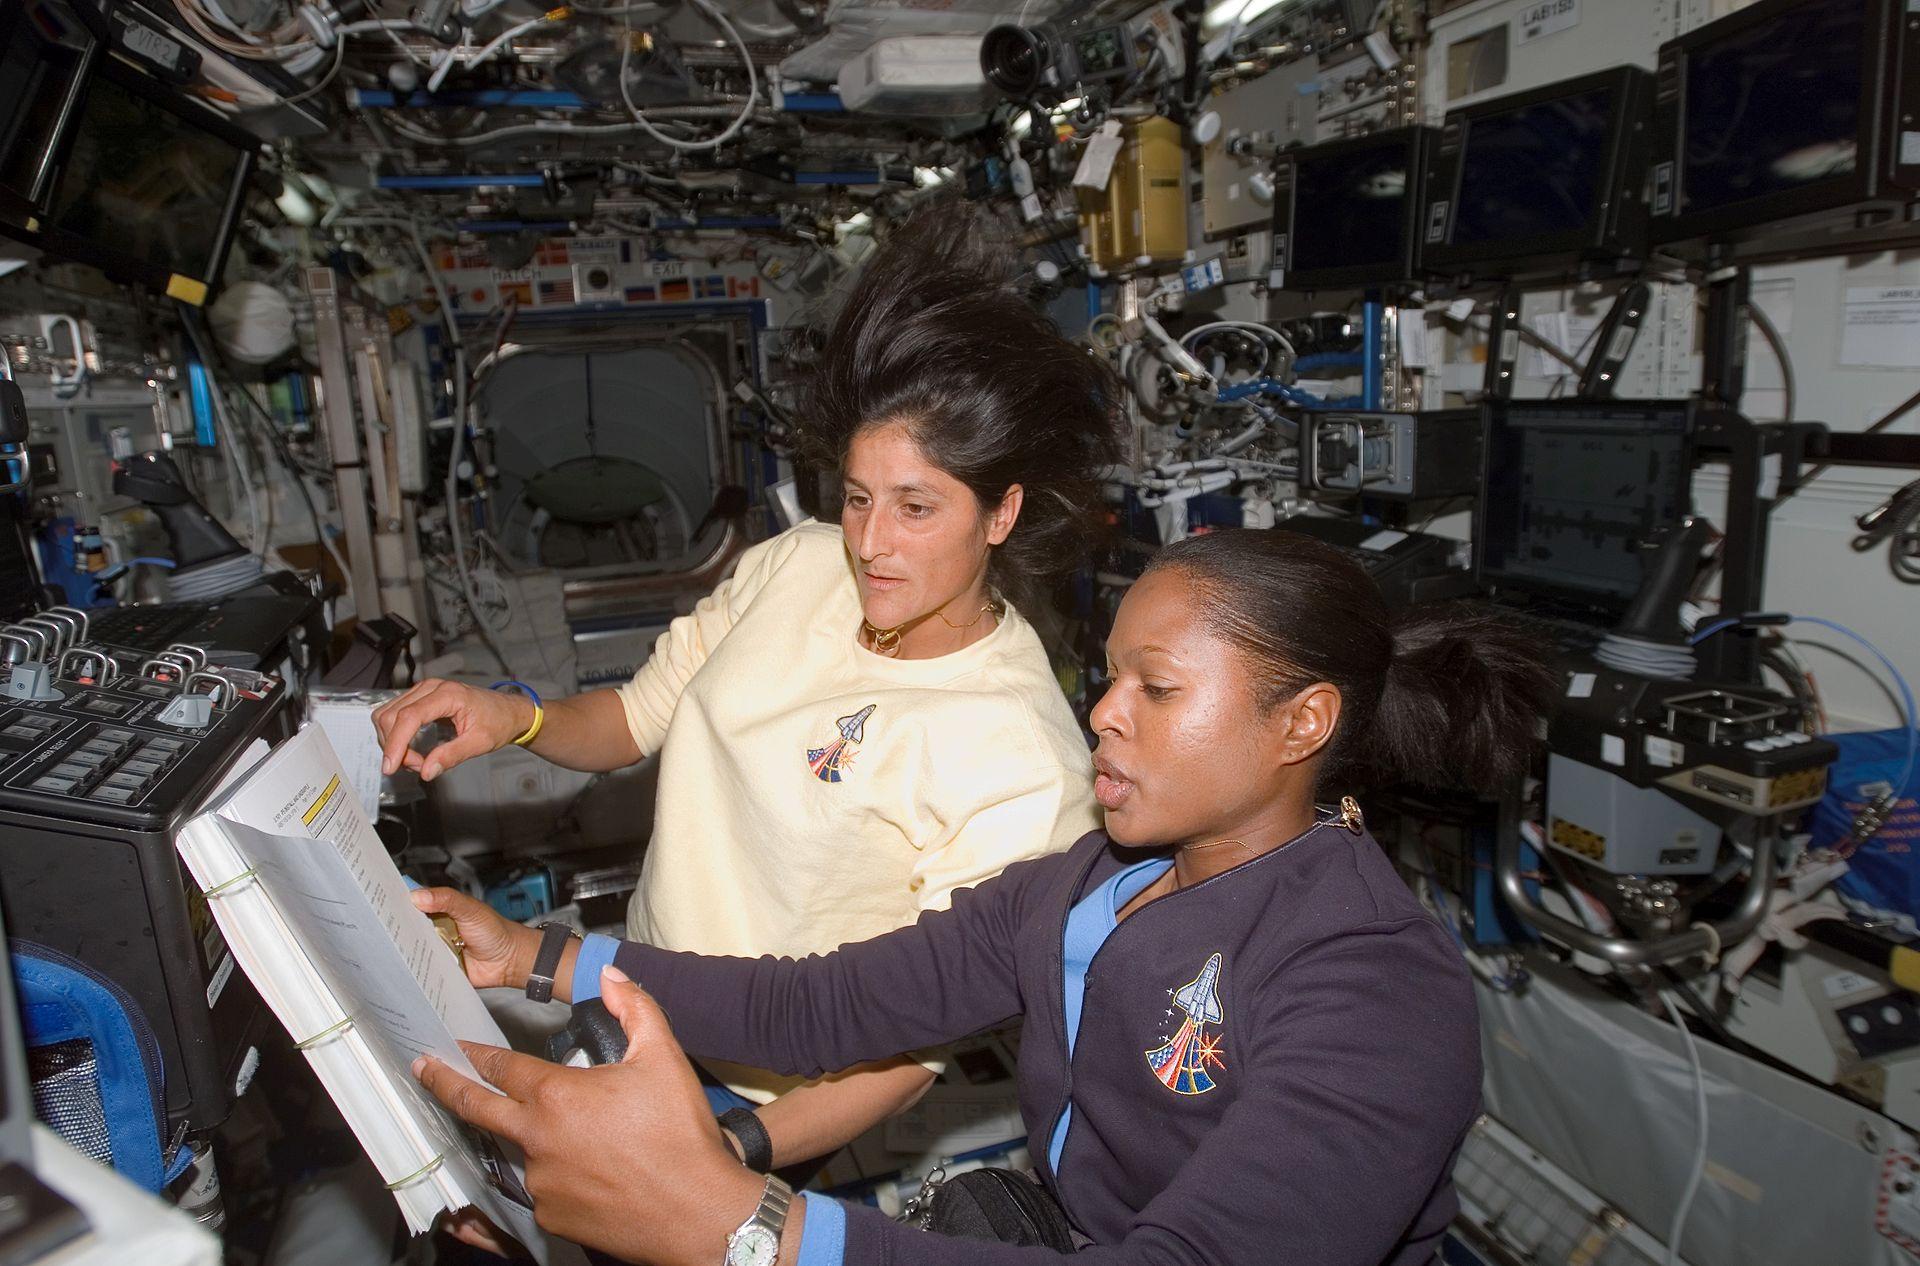 joan the astronaut - photo #20